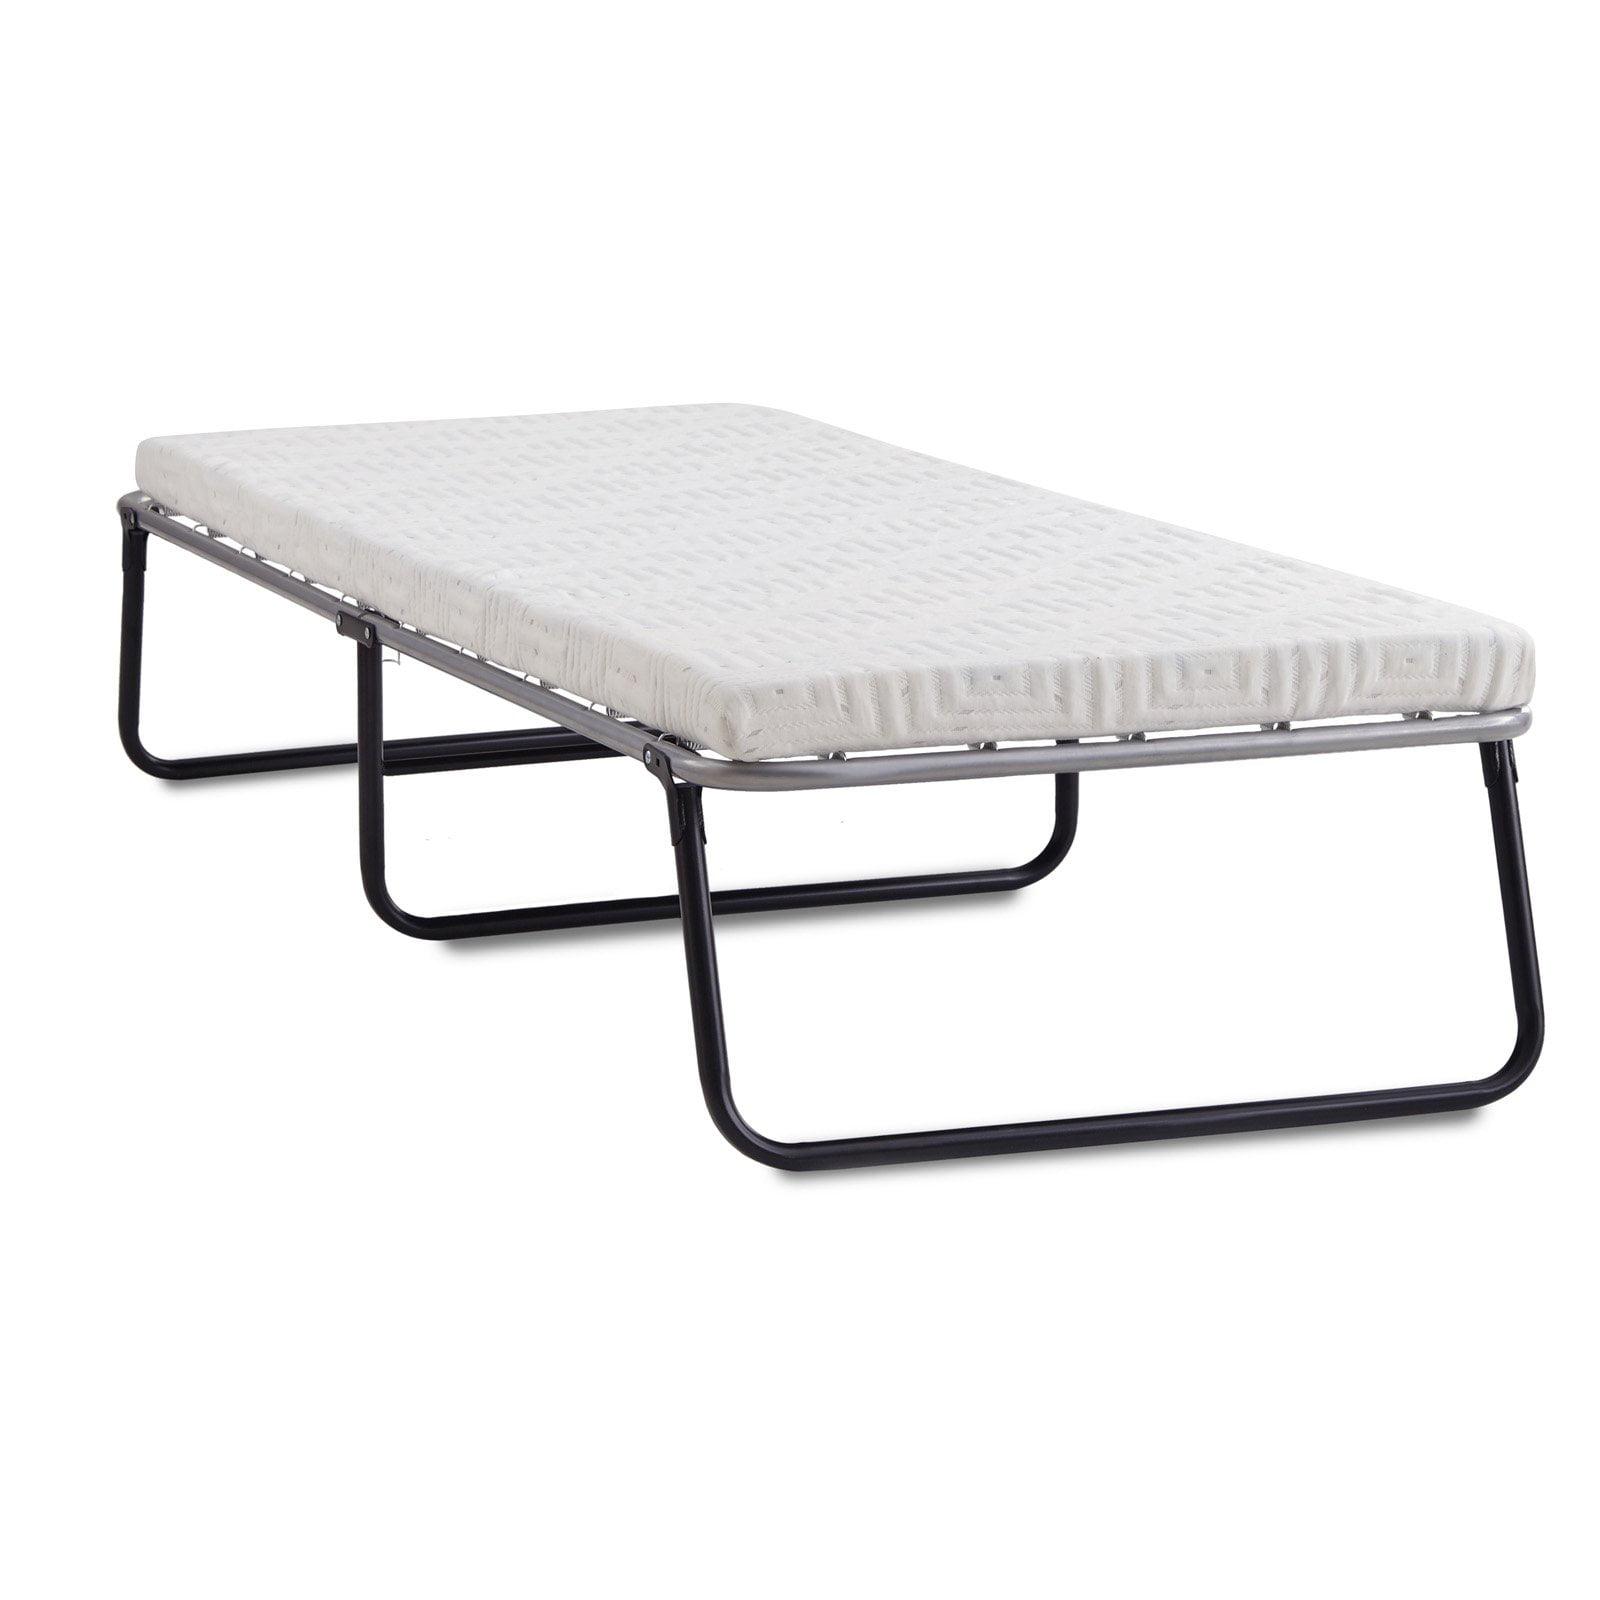 New Folding Bed Memory Foam Mattress